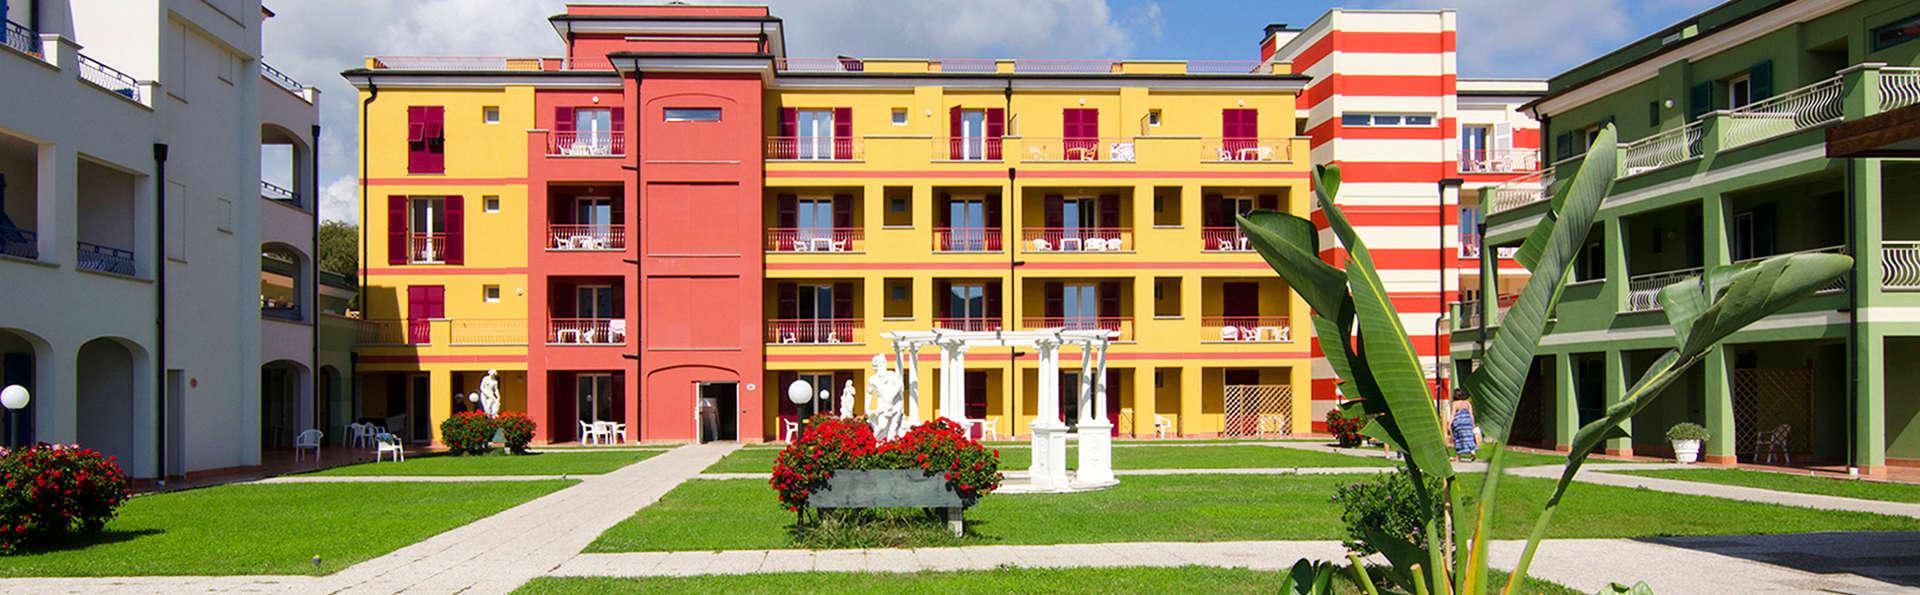 Ai Pozzi Village - edit_I-giardini-interni.jpg